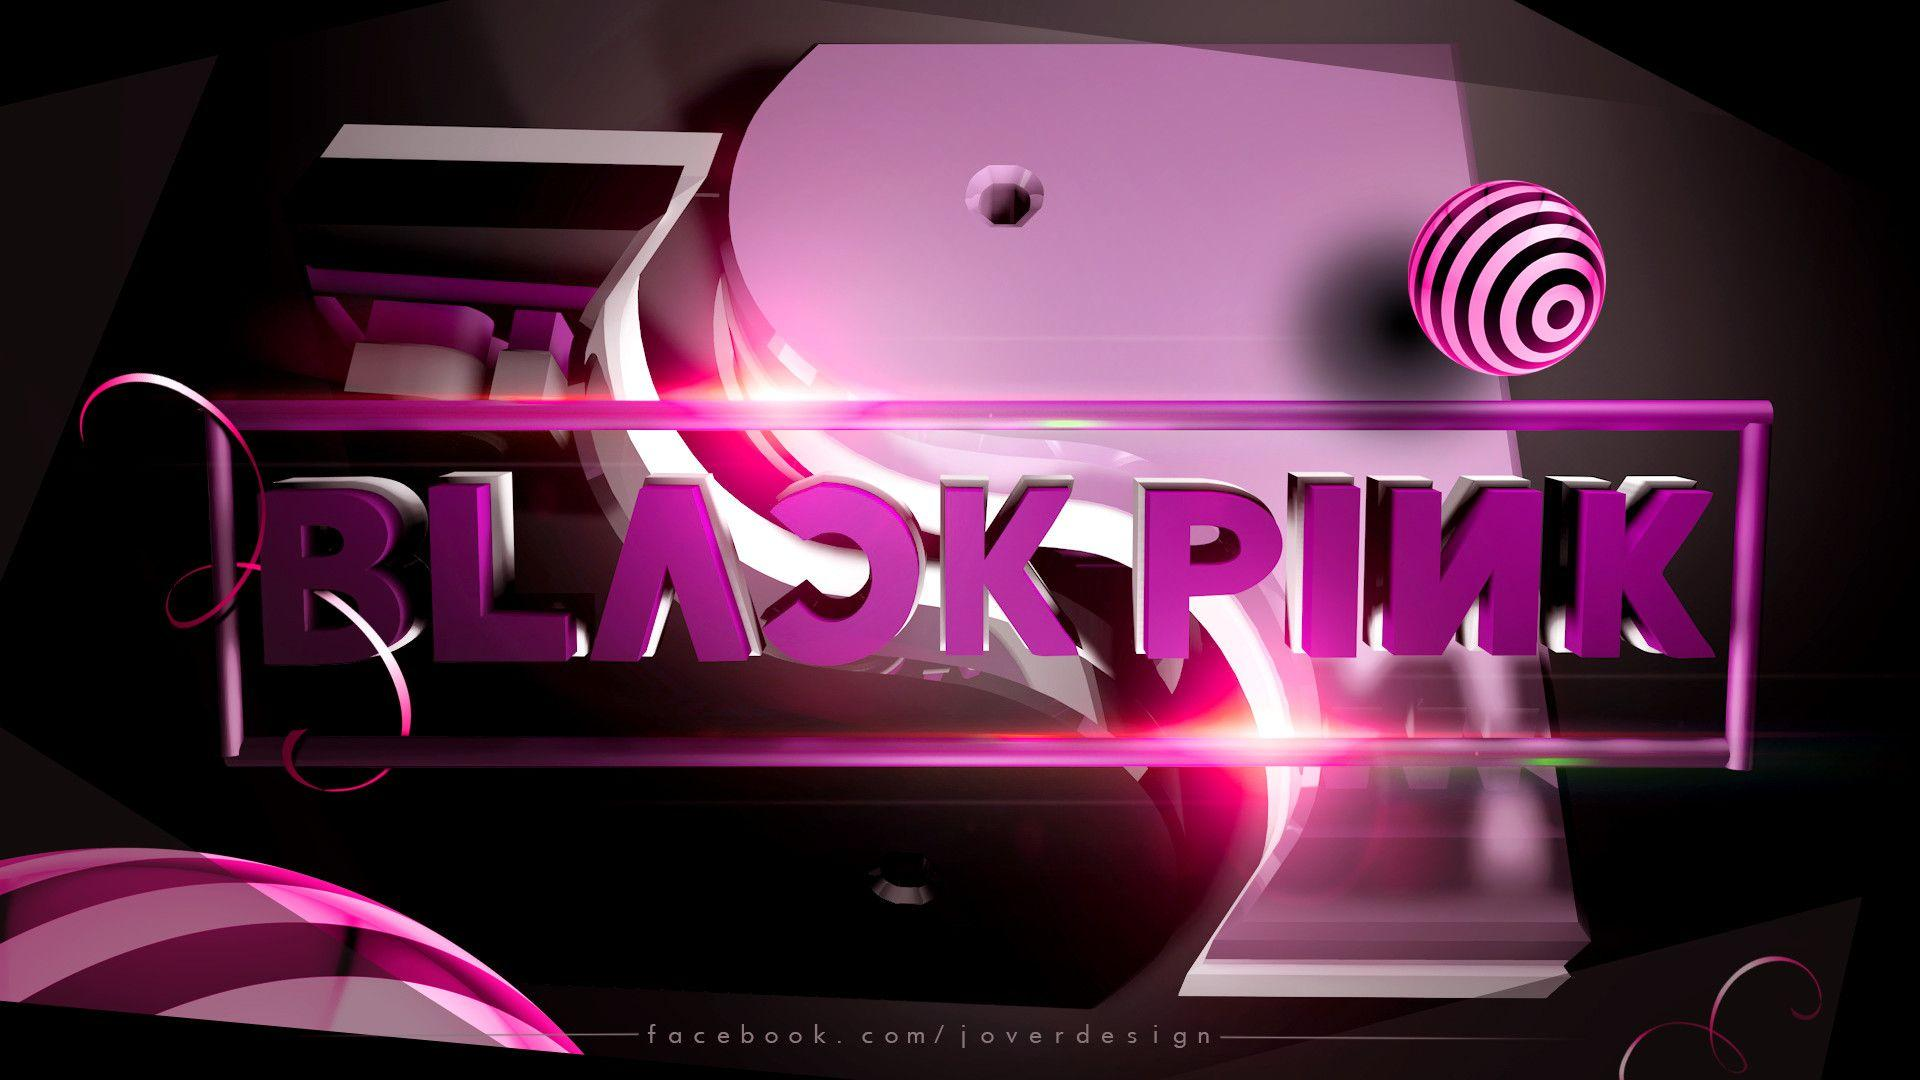 Blackpink Logo Wallpapers - Wallpaper Cave